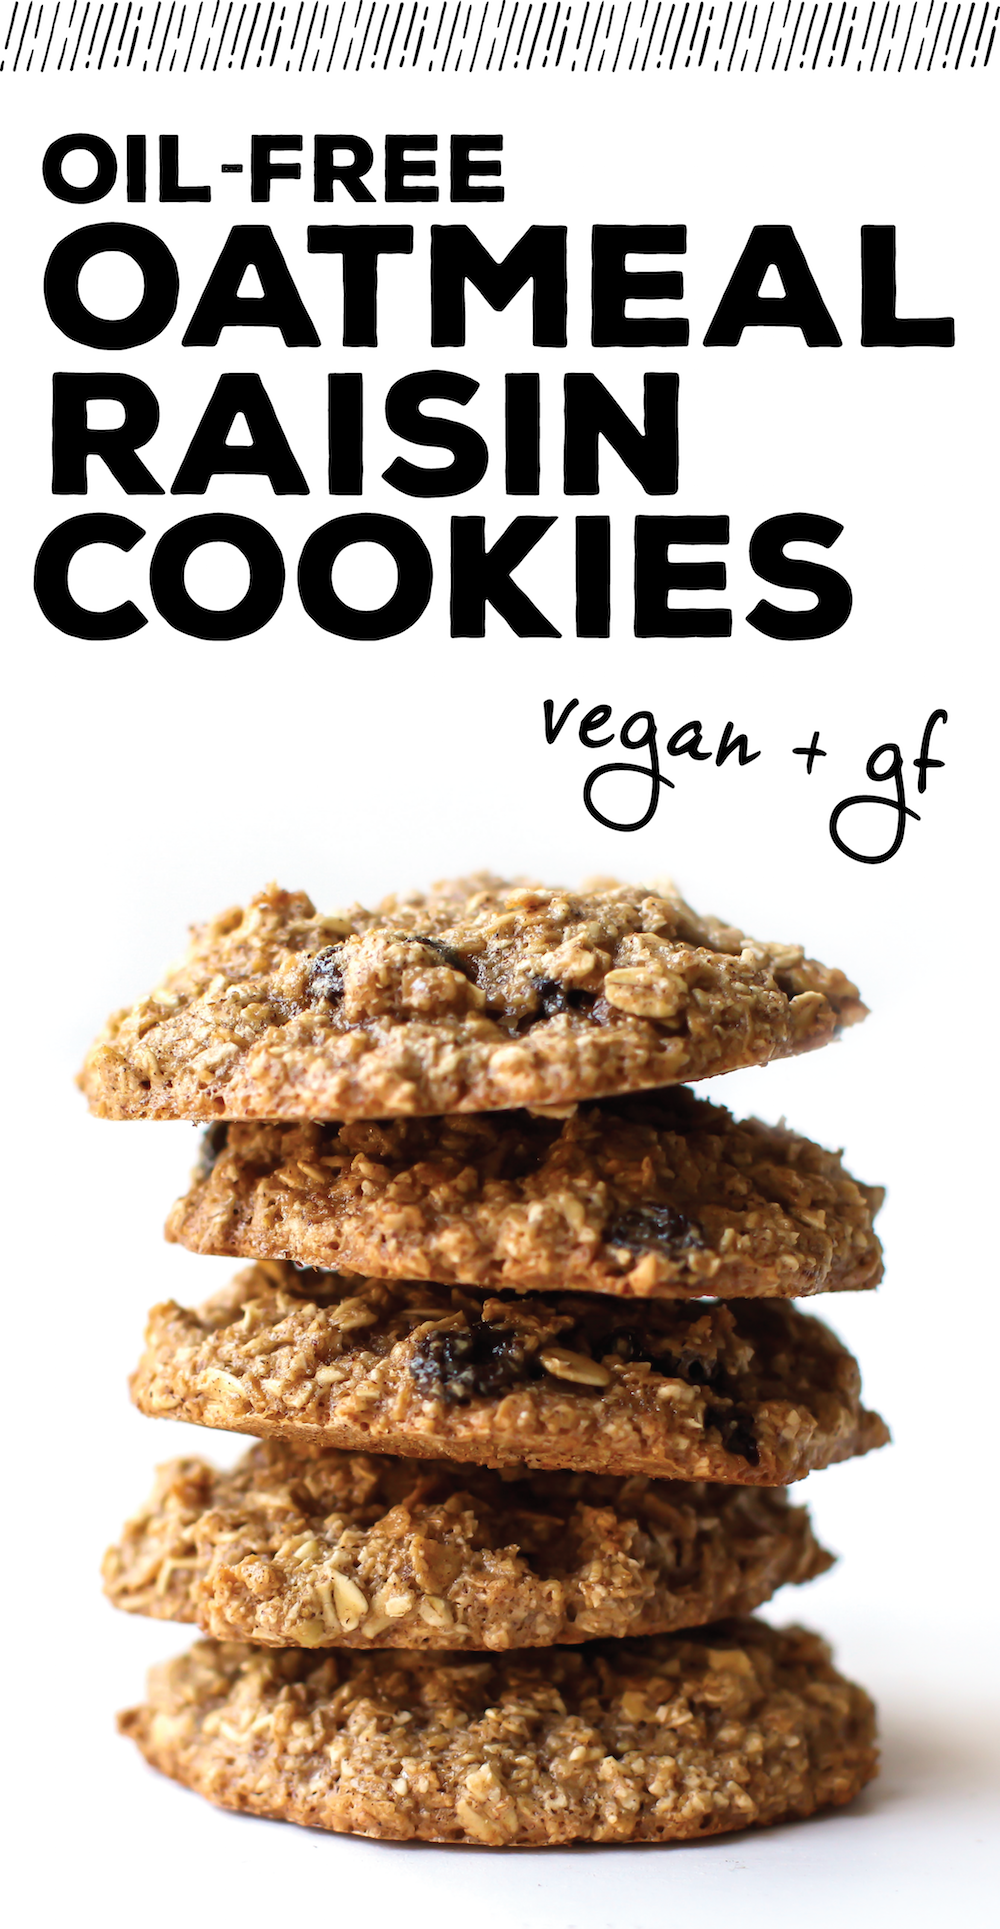 Oil Free Oatmeal Raisin Cookies Vegan Gluten Free Recipe Vegan Oatmeal Raisin Cookies Oatmeal Raisin Cookies Oil Free Vegan